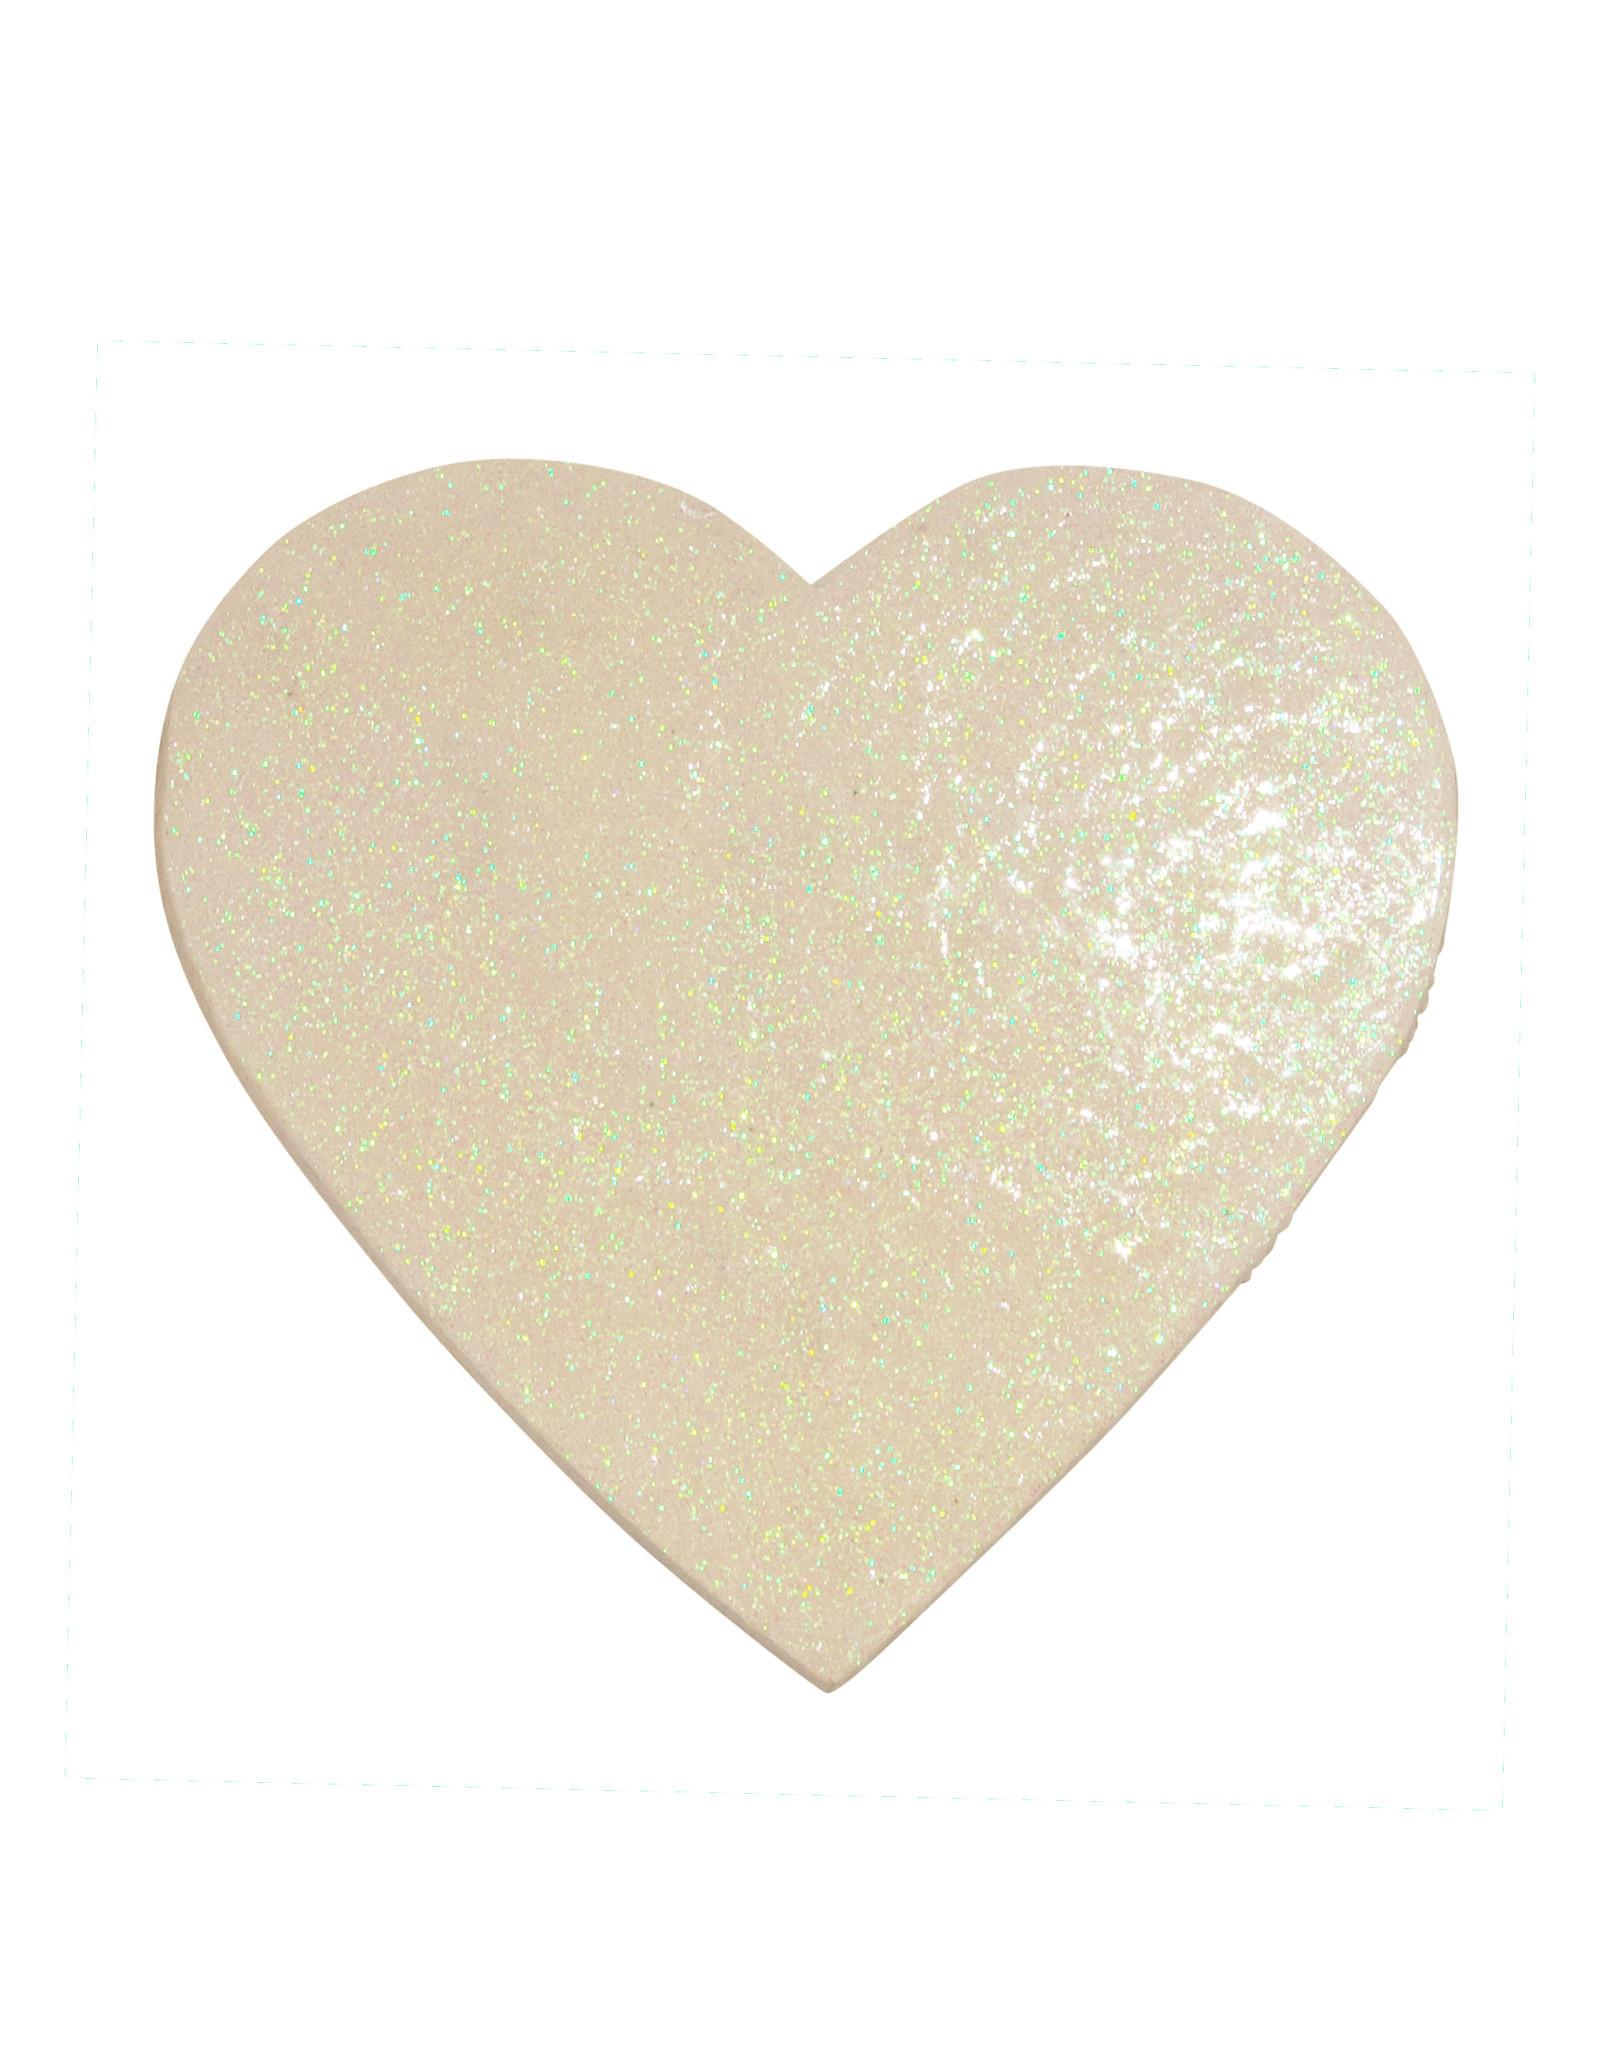 Entouquet Pearlescent Glitter Large Heart Tile